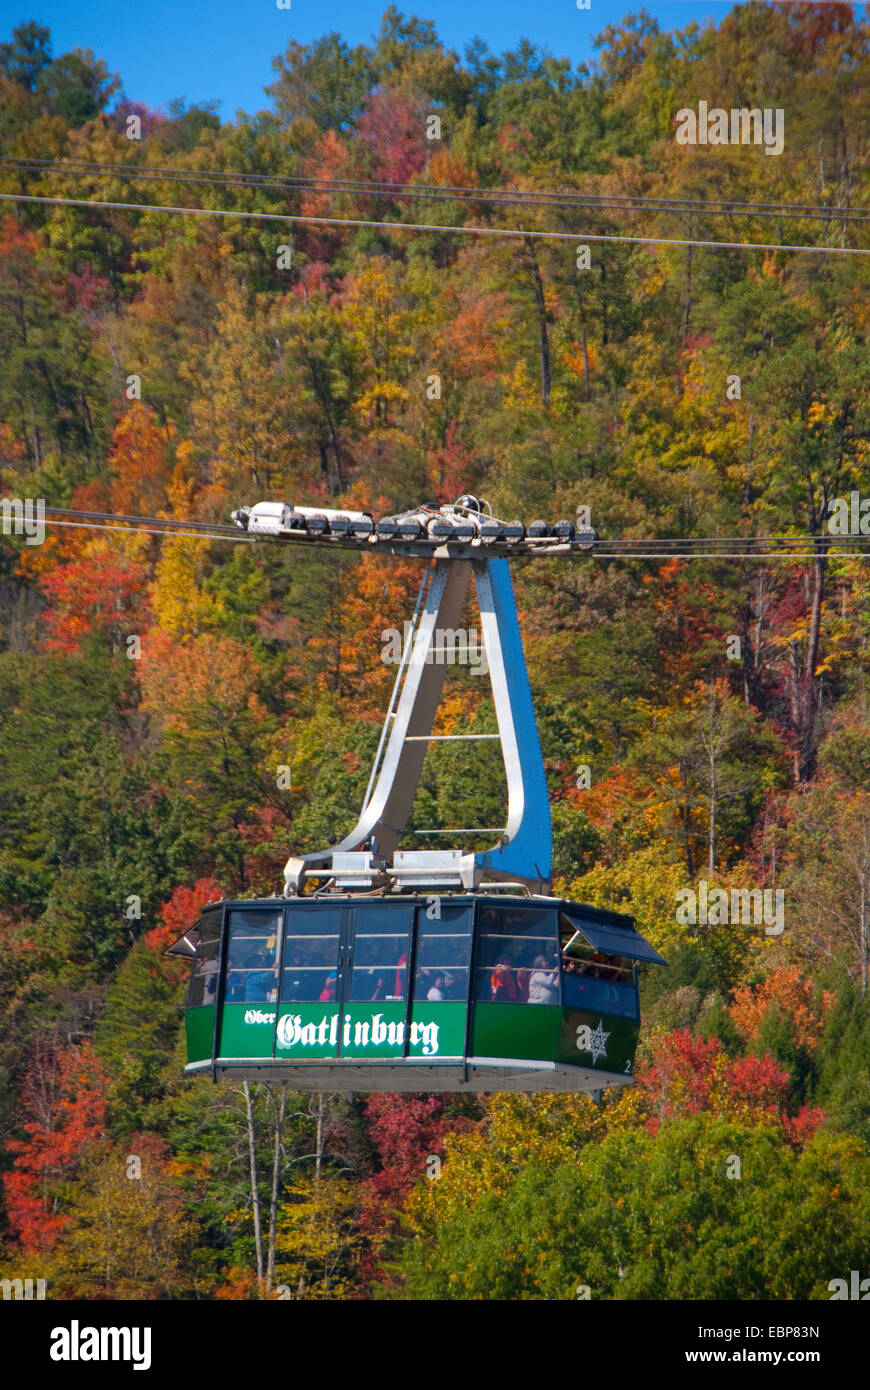 Tram car of Ober Gatlinburg Aerial Tramway in autumn. Stock Photo